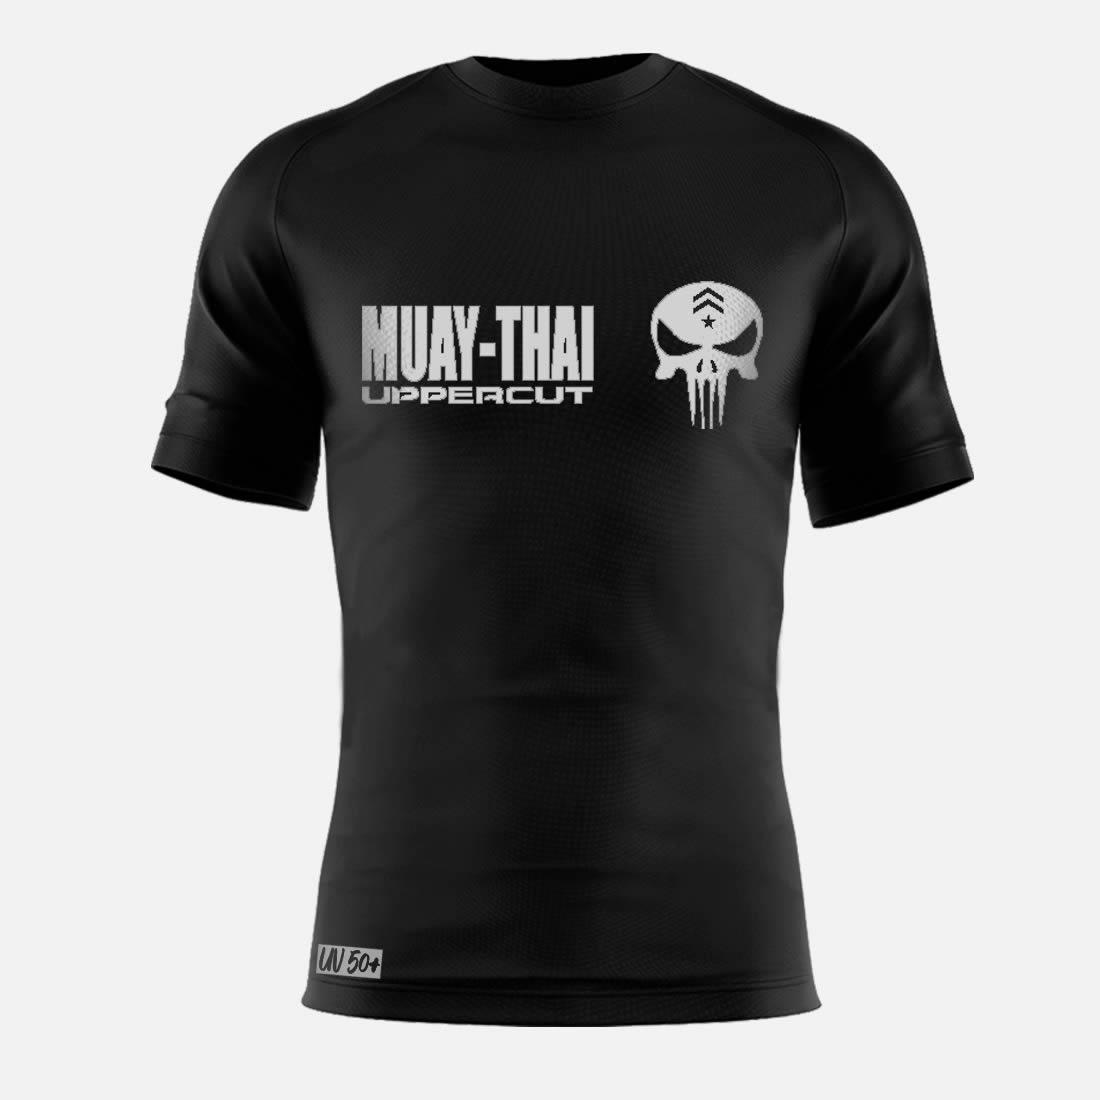 Camisa Muay Thai Caveira War - Dry Fit UV-50+ - Preta